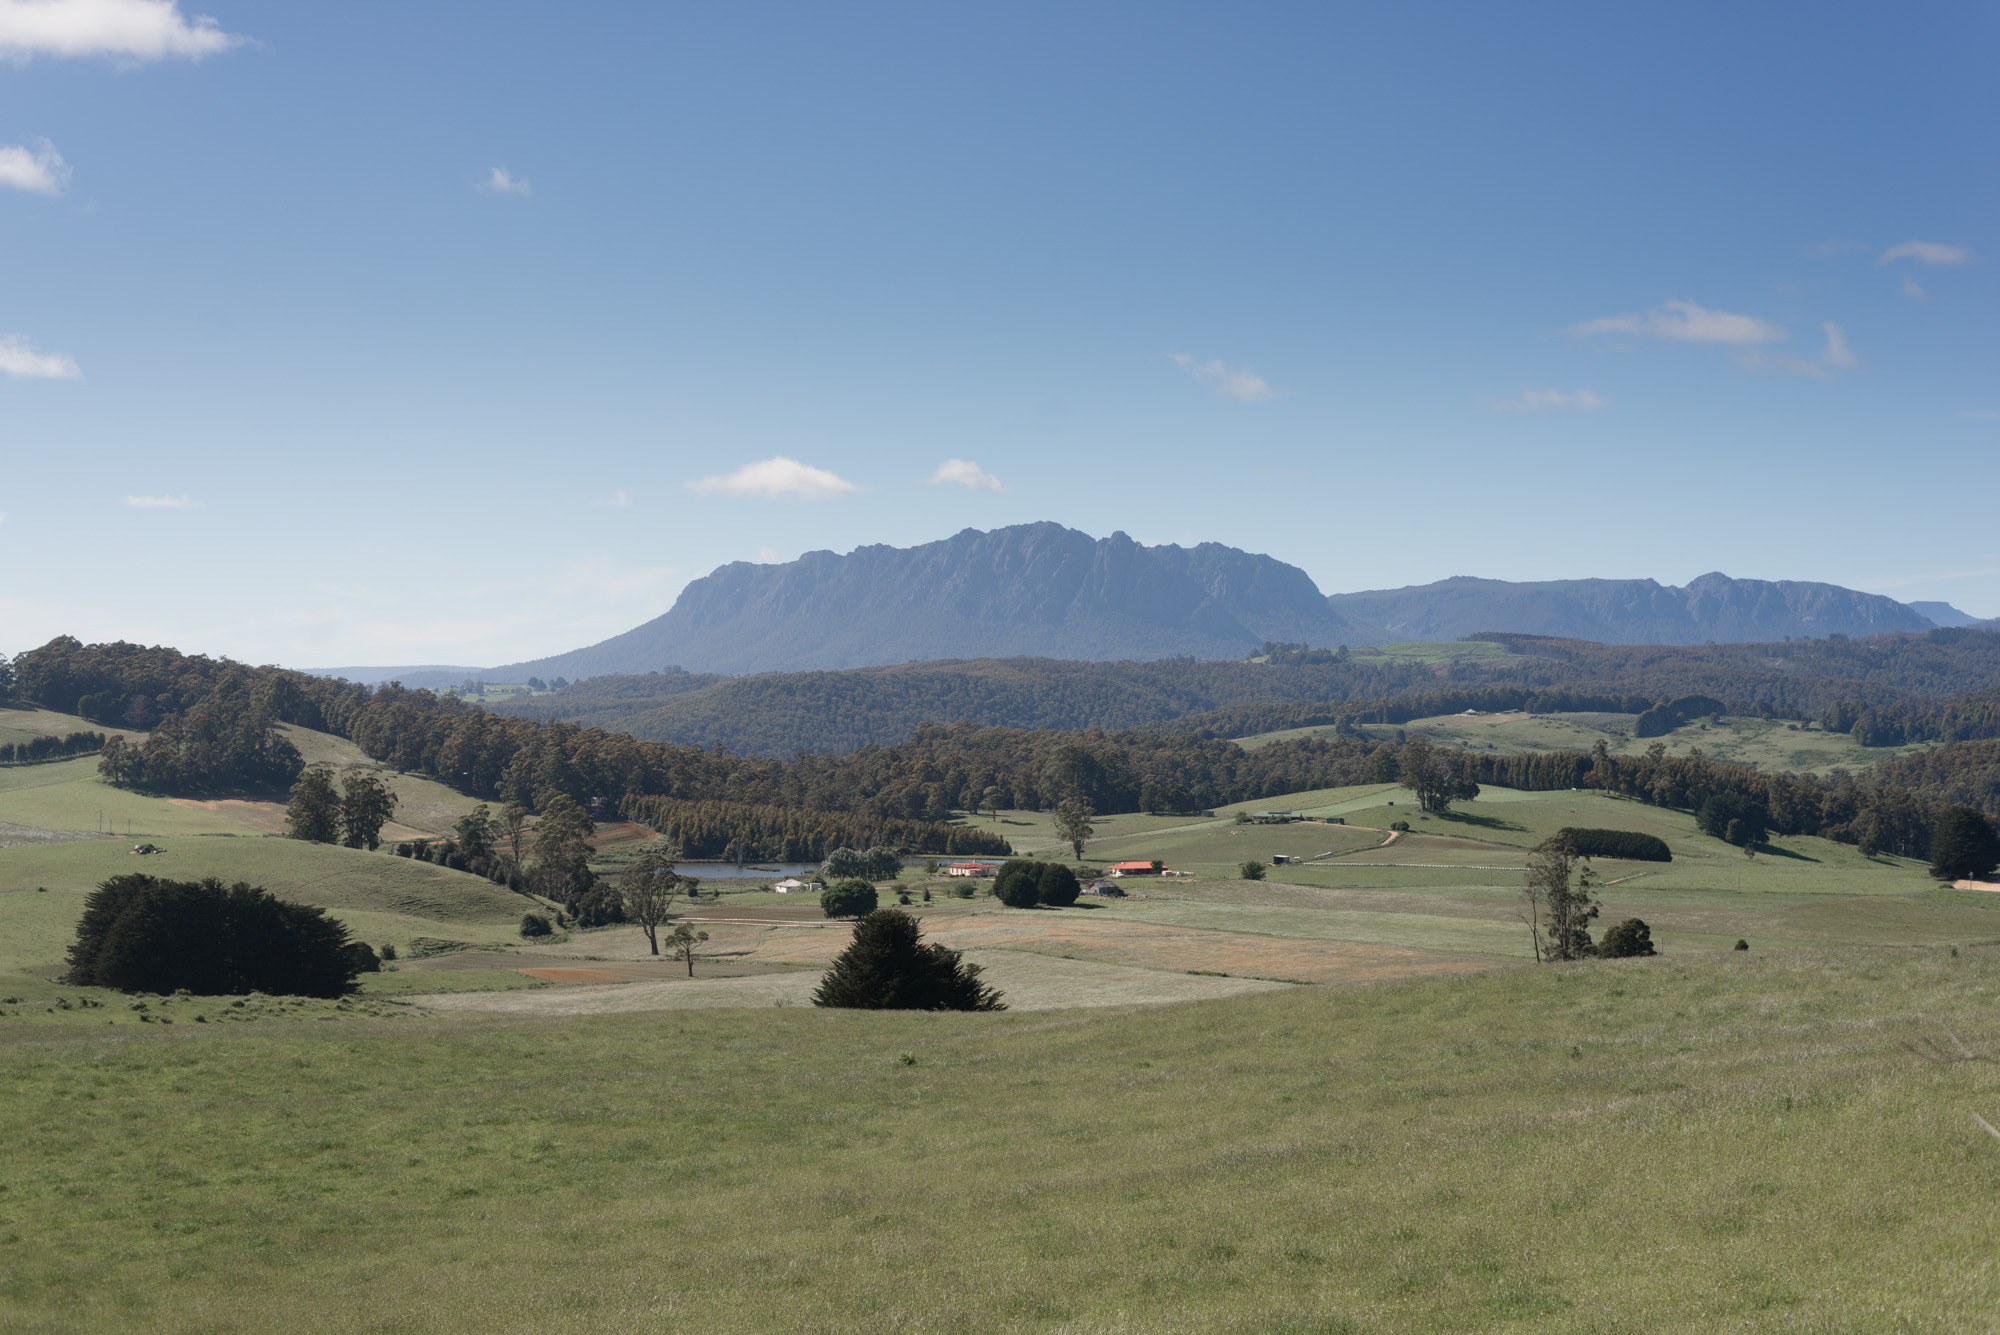 cradle mountain lookout tas